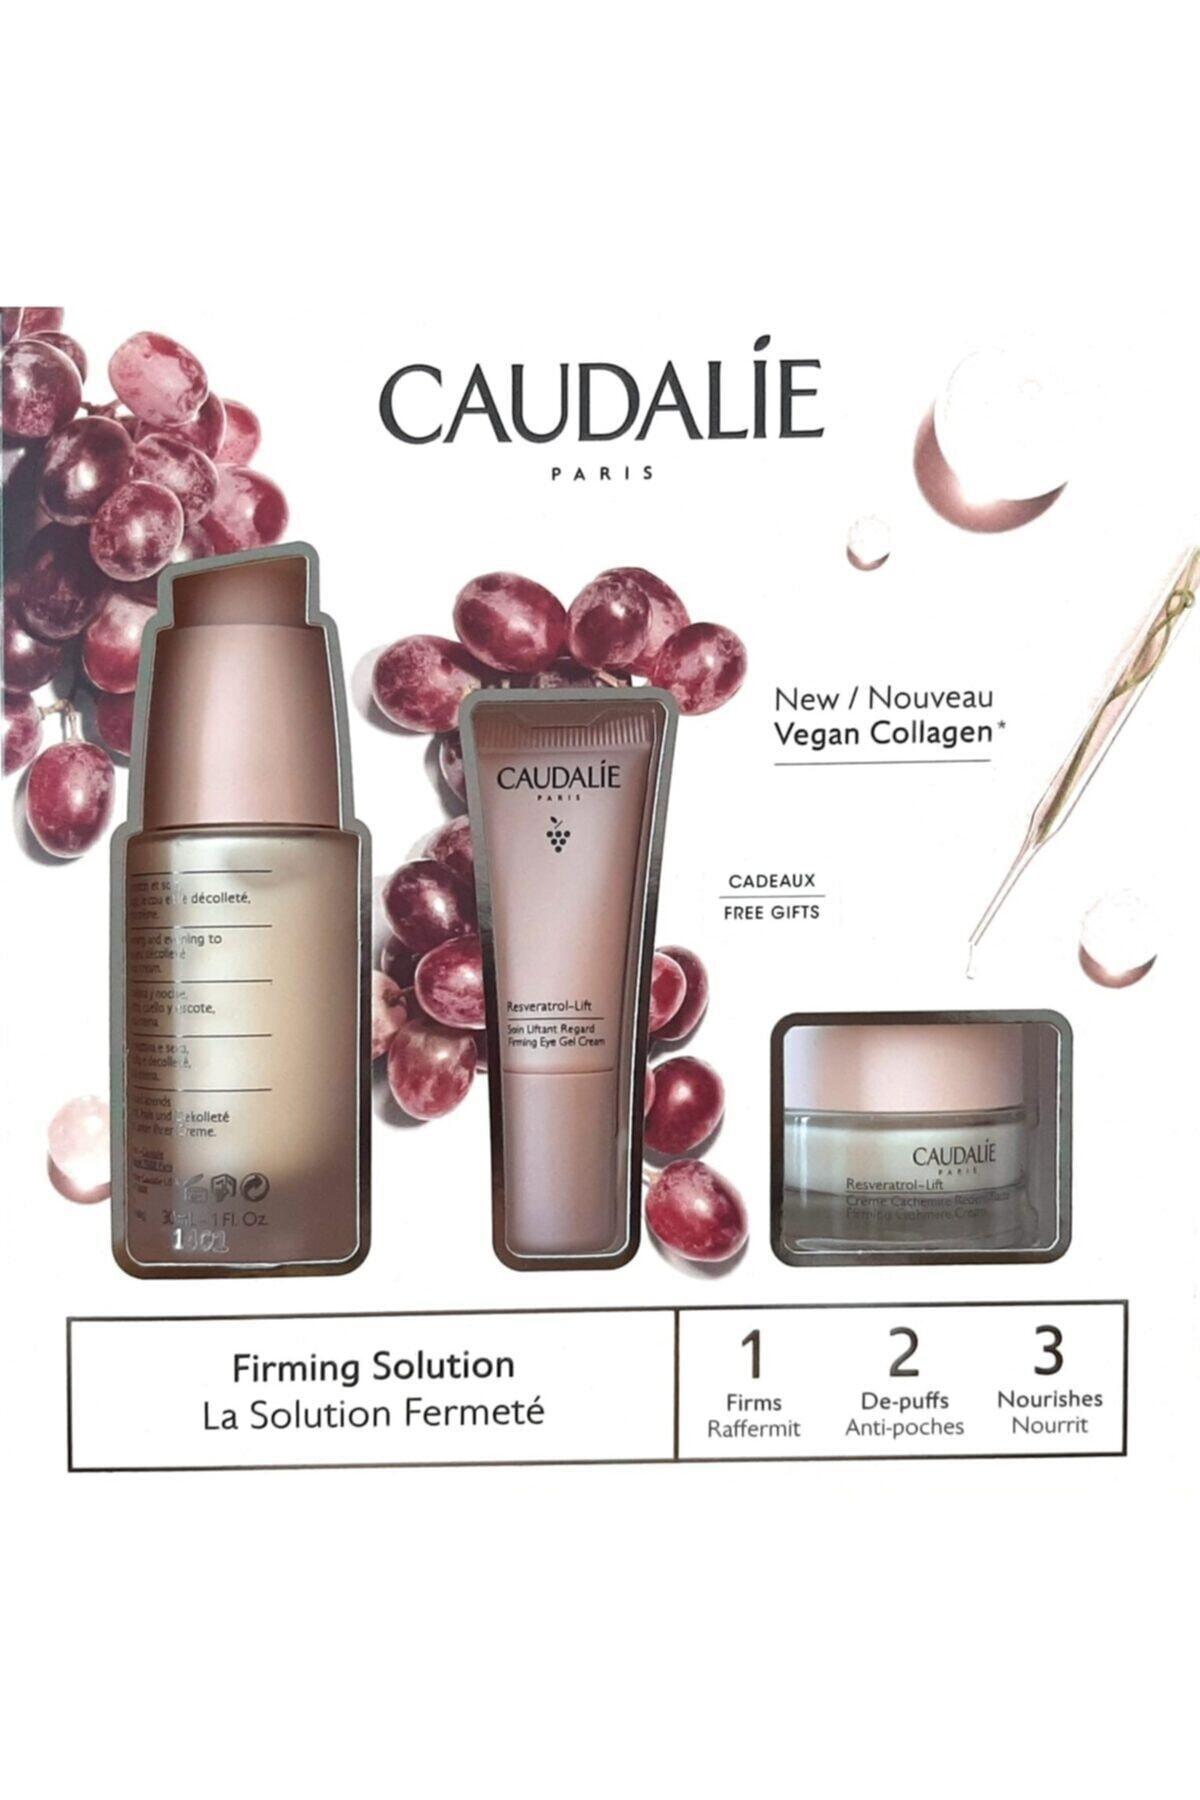 Caudalie Resveratrol Lift Set-ınstant Firming Serum 30 Ml + Firming Eye Gel Cream 5 Ml+ Firming Cash 1